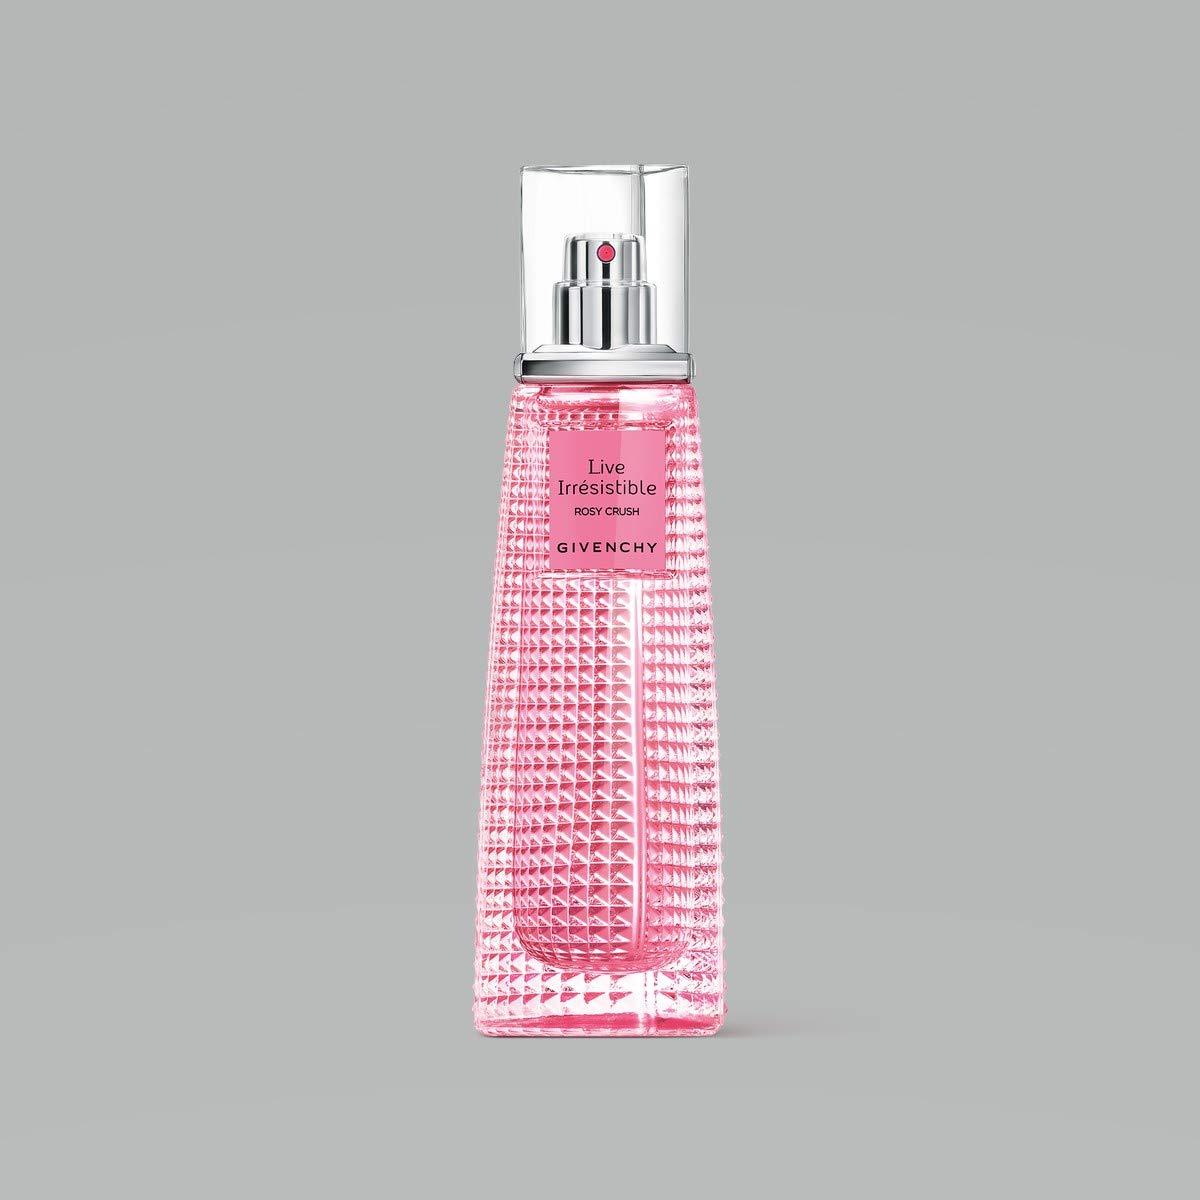 Eau Parfum 50 For Live Ml Irresistible Spray Crush Rosy De Women XOZPkiu